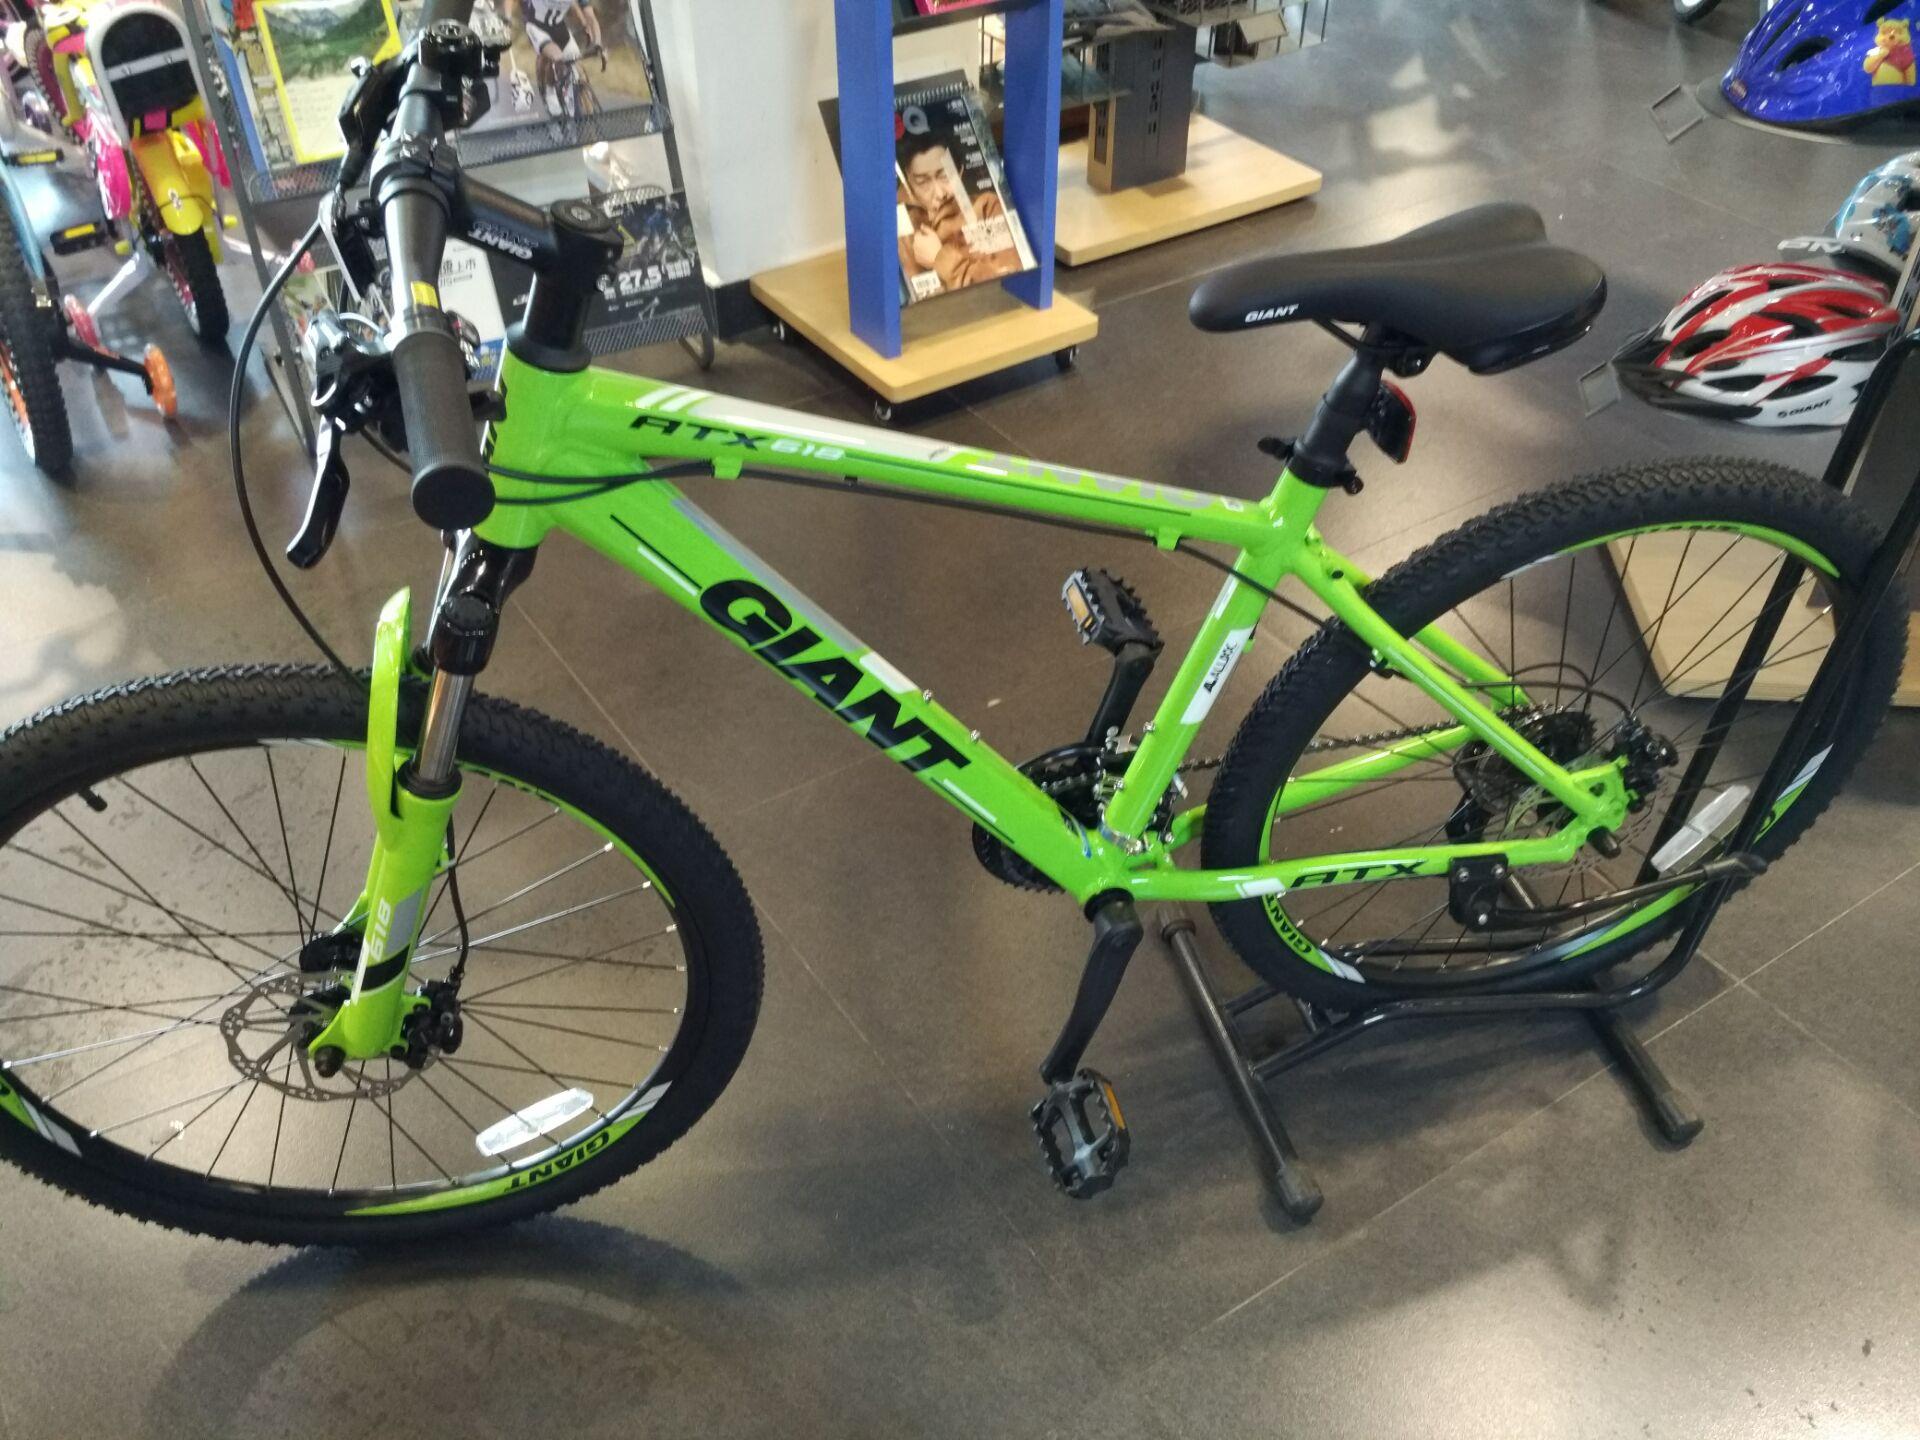 giant atx 618 green